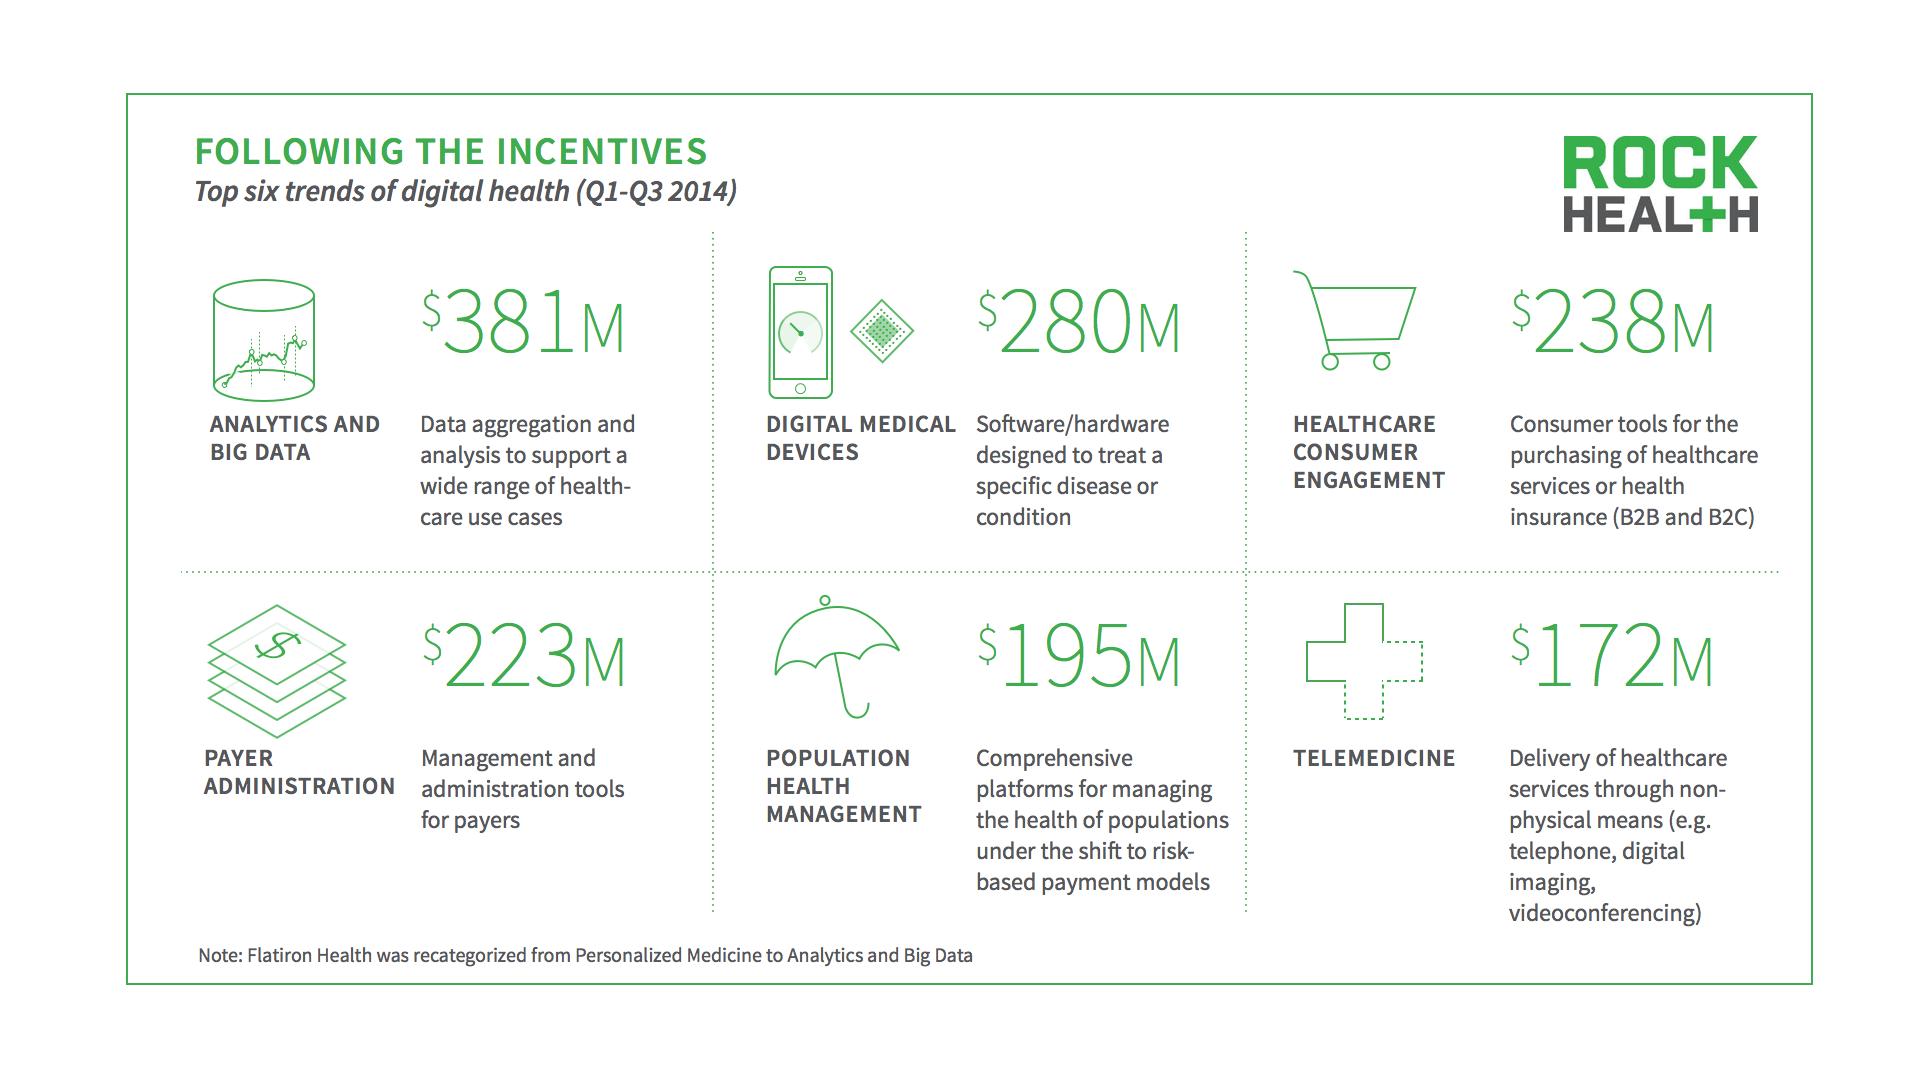 Rock Health Digital Health Funding Report Q3 2014